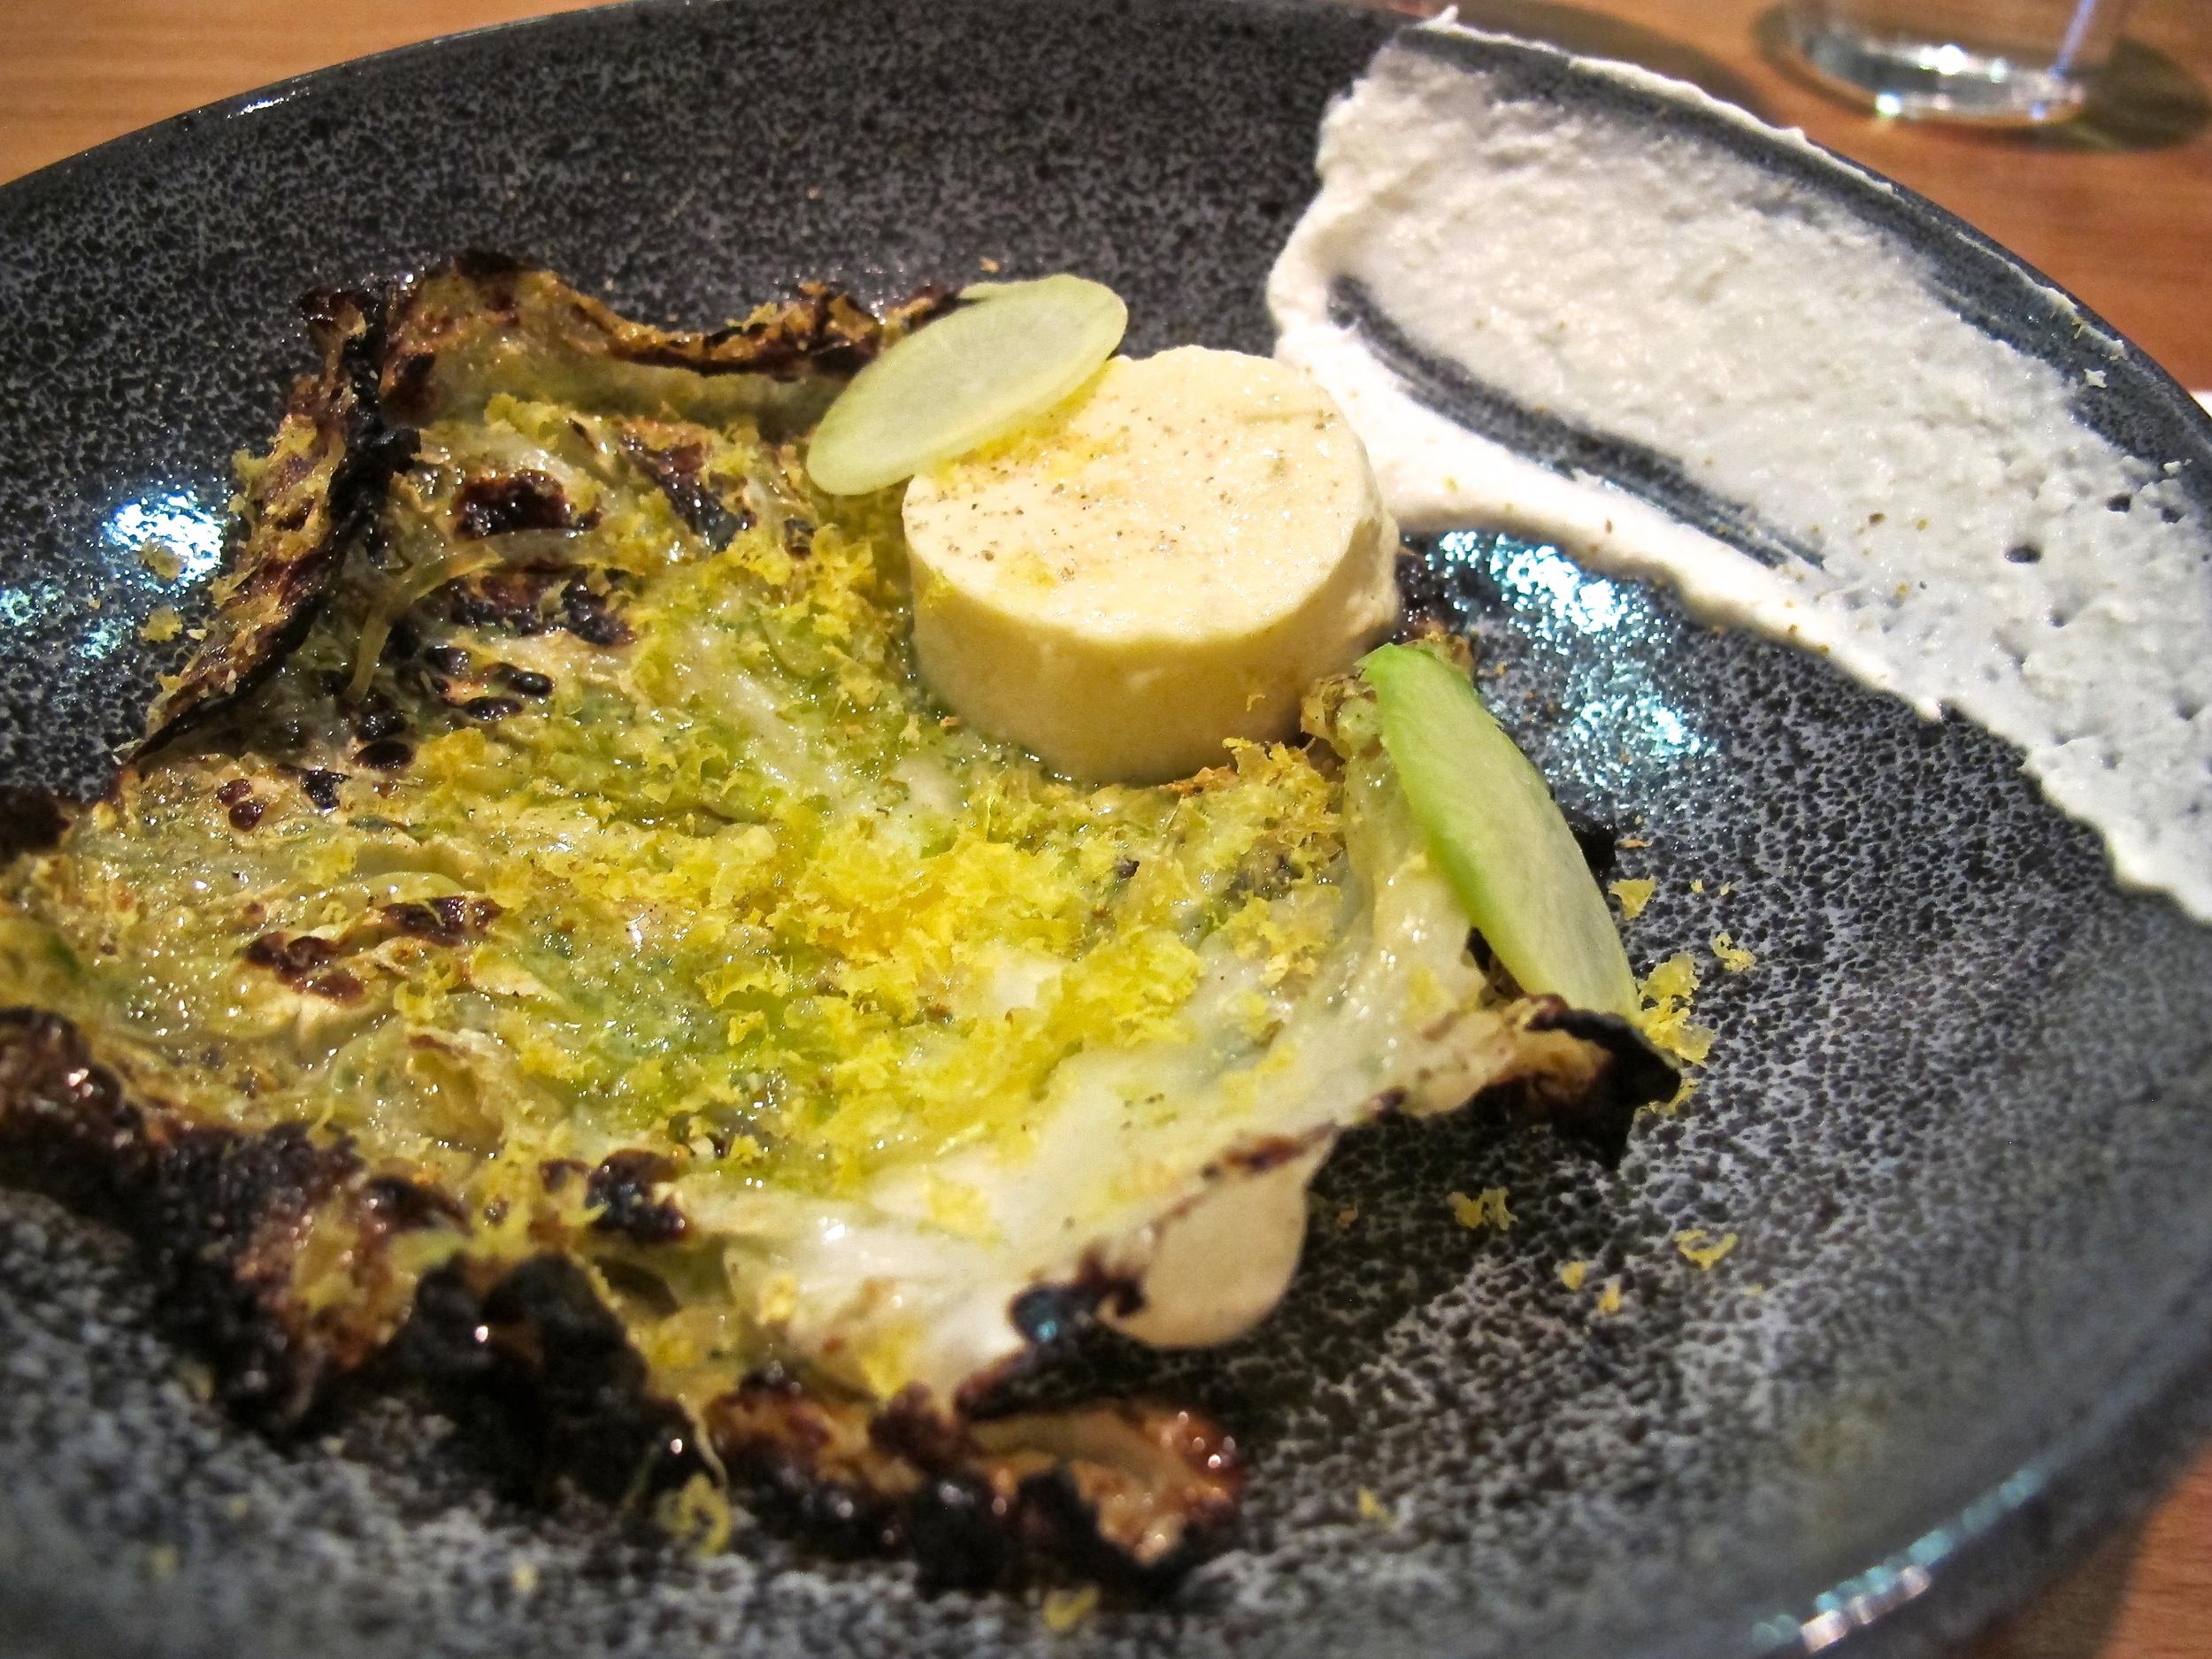 trois mec grilled cabbage.JPG